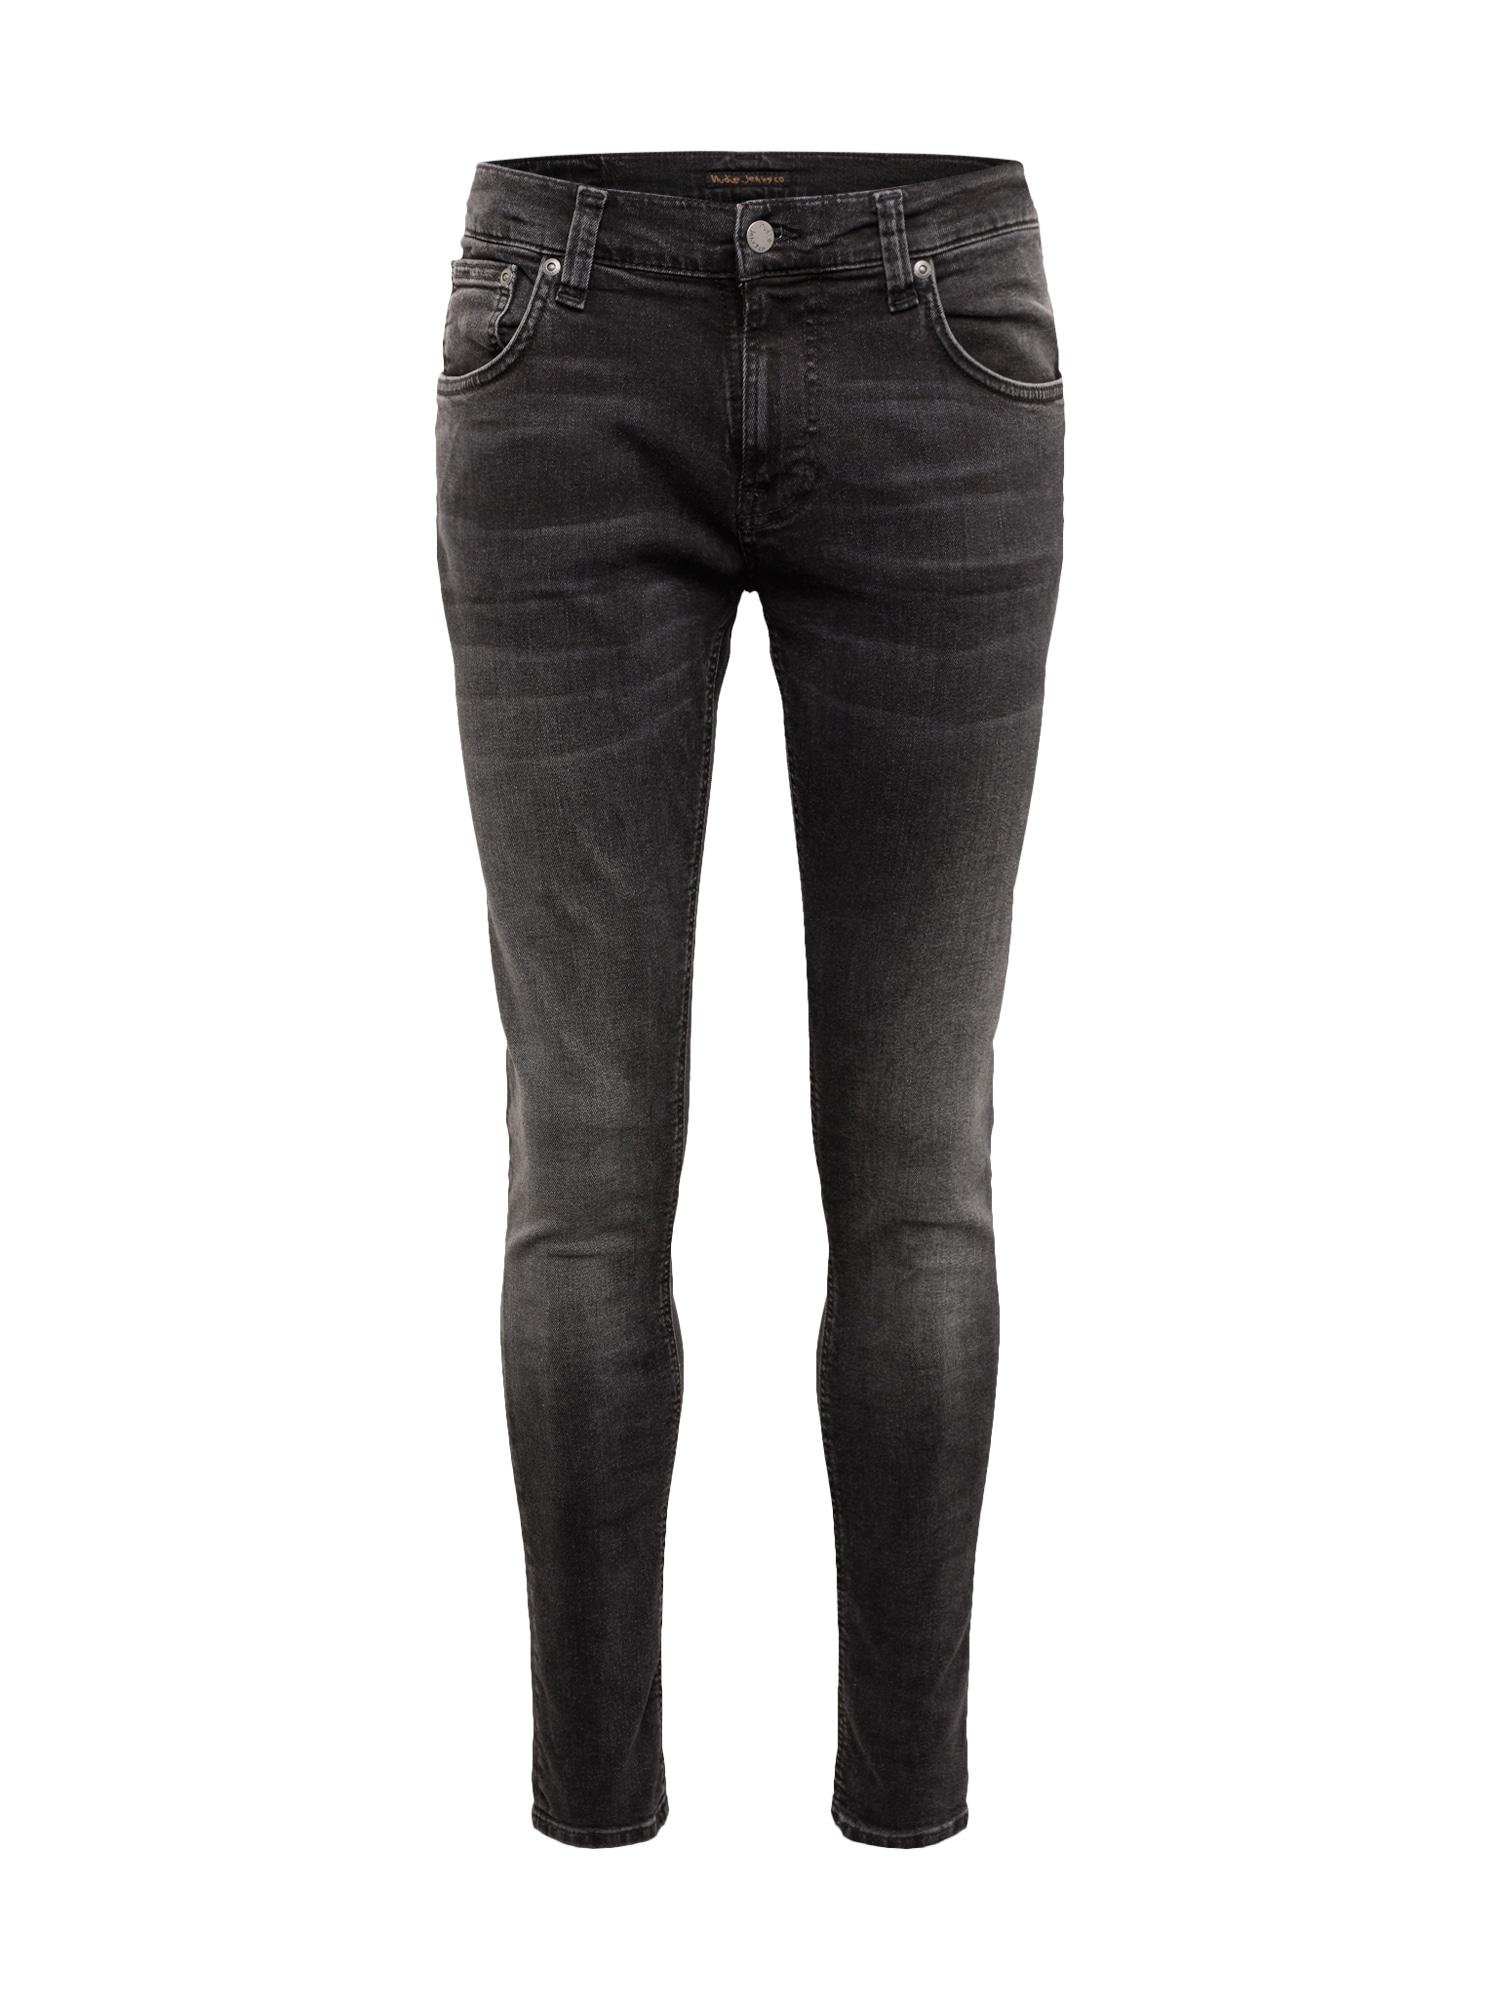 Jeans 'Tight Terry' | Sportbekleidung > Sporthosen > Tights | Nudie Jeans Co